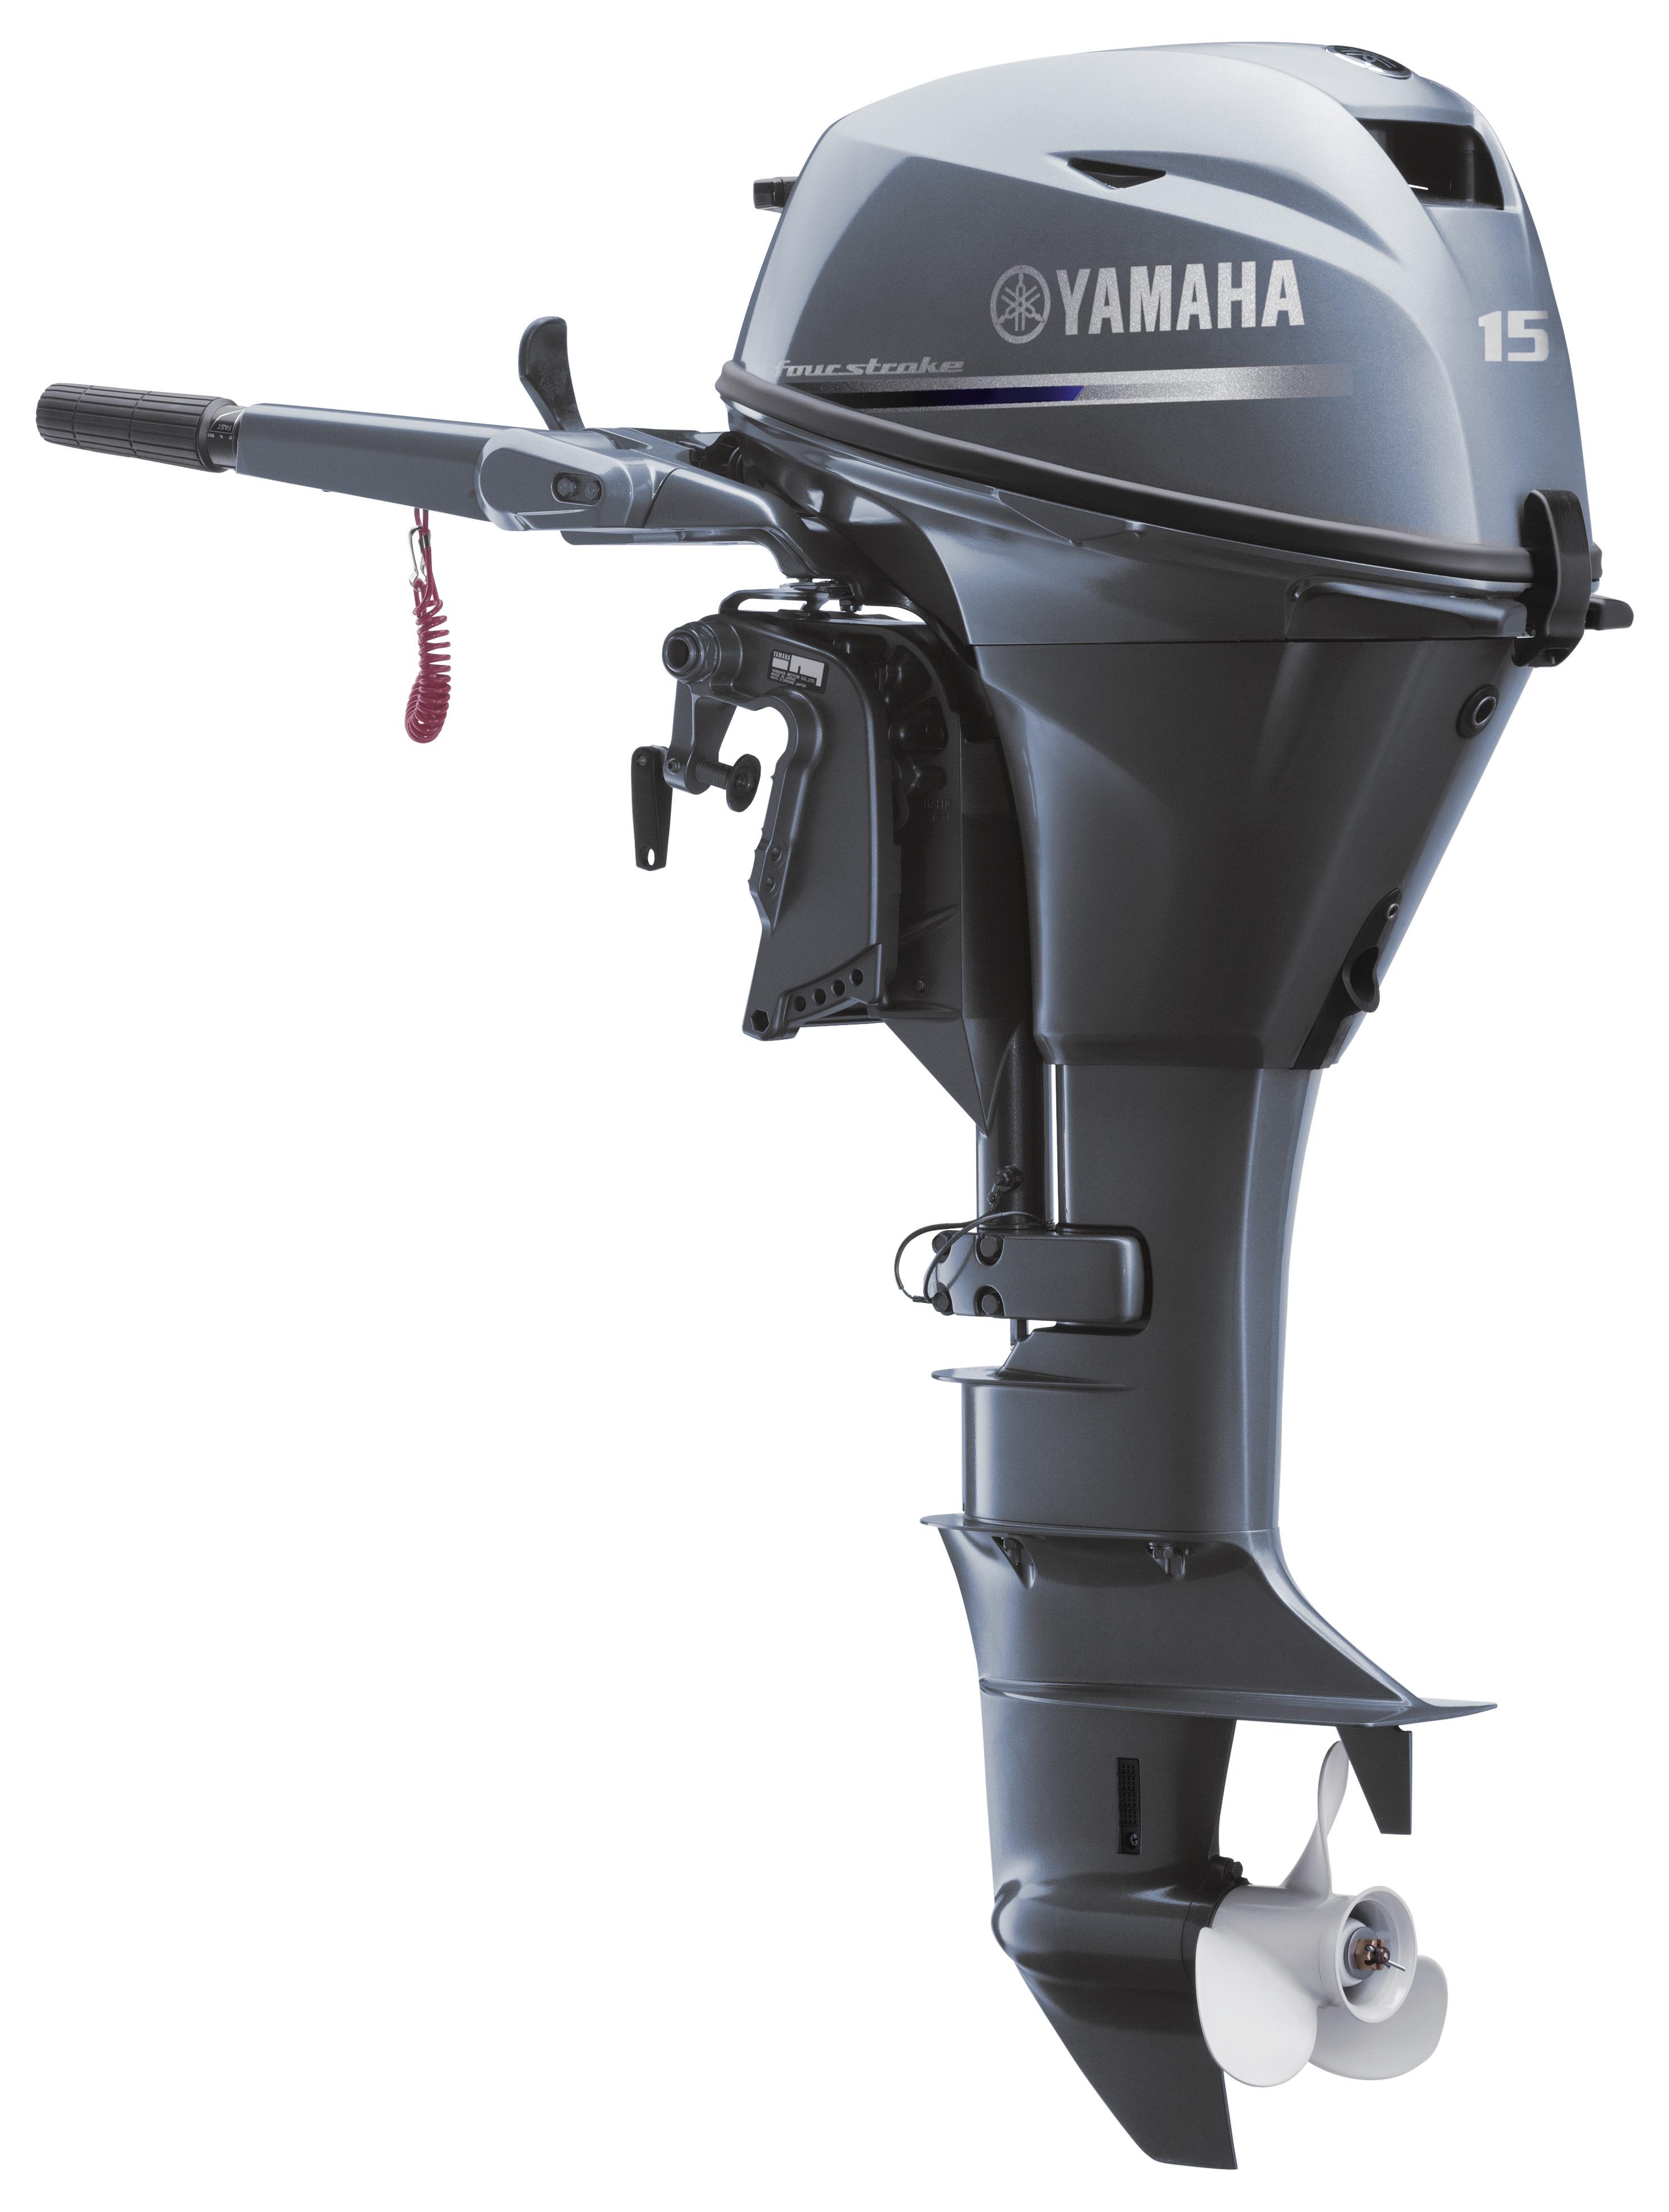 F15seha Yamaha 4 Stroke 15hp Short Shaft Electric Start Portable Outboard For Sale Brisbane Yamaha